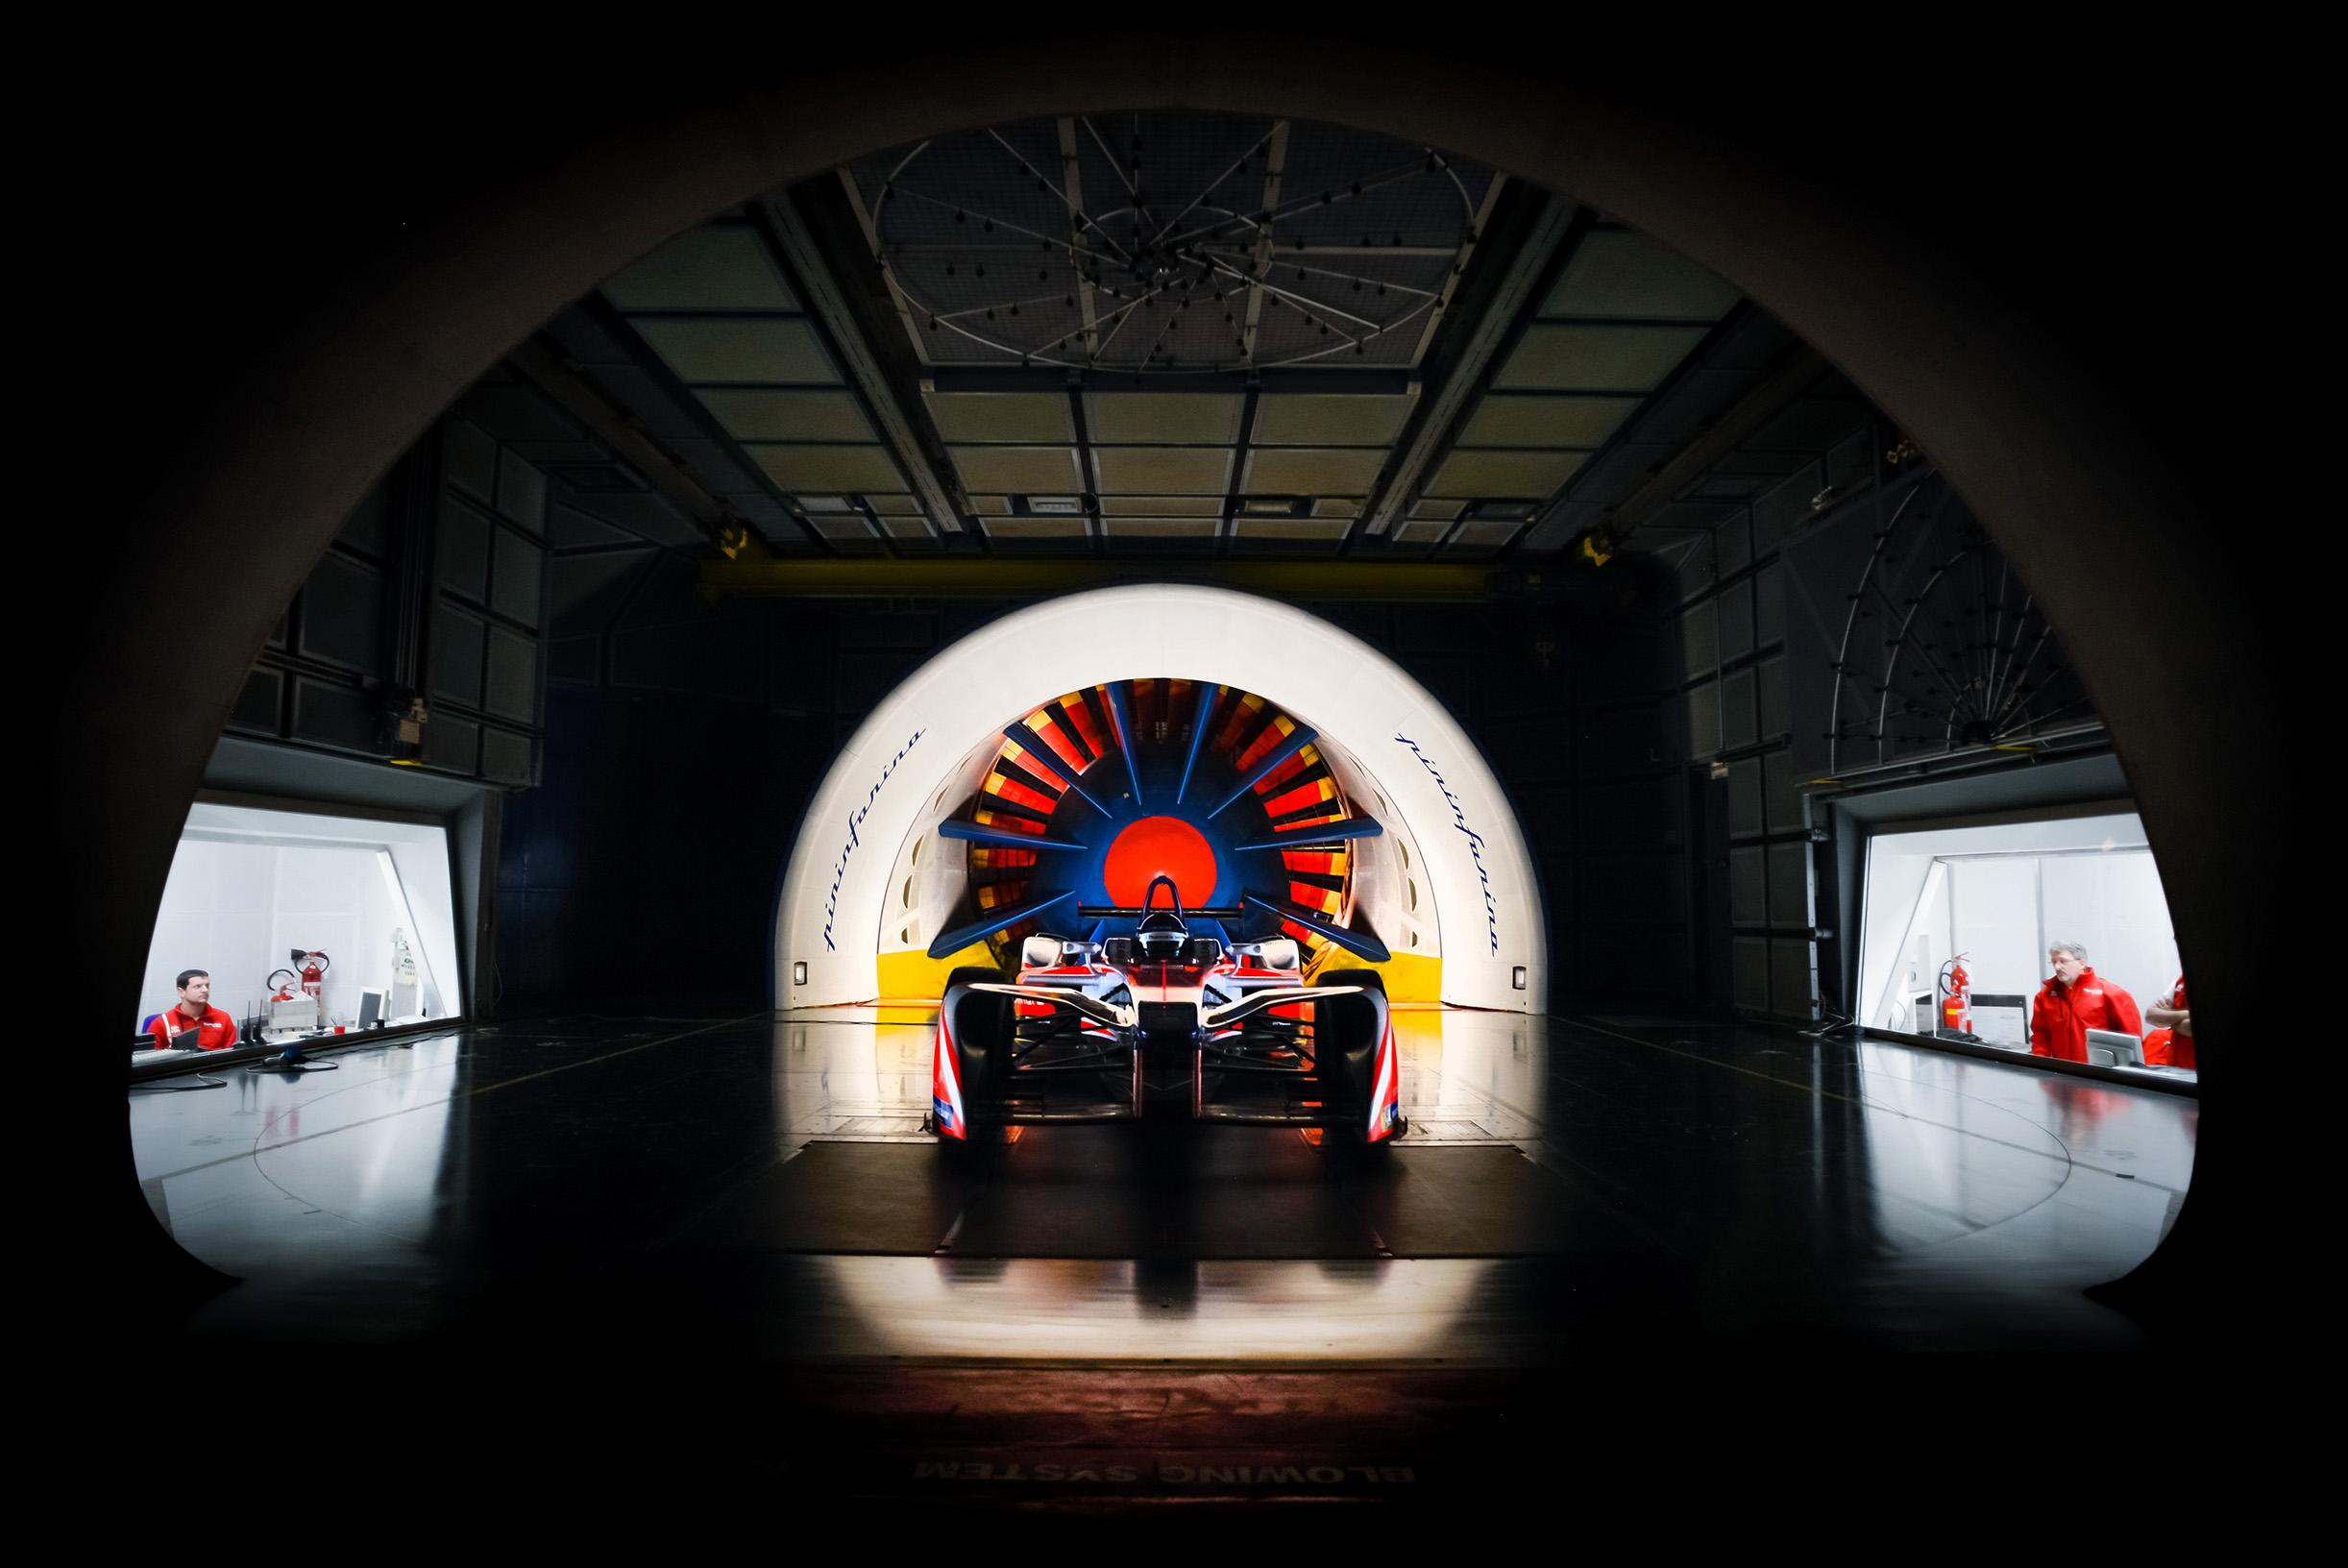 aaSpacesuit-Media-Marta-Rovatti-Studihrad-FIA-Formula-E-Mahindra-2018_MRS6938